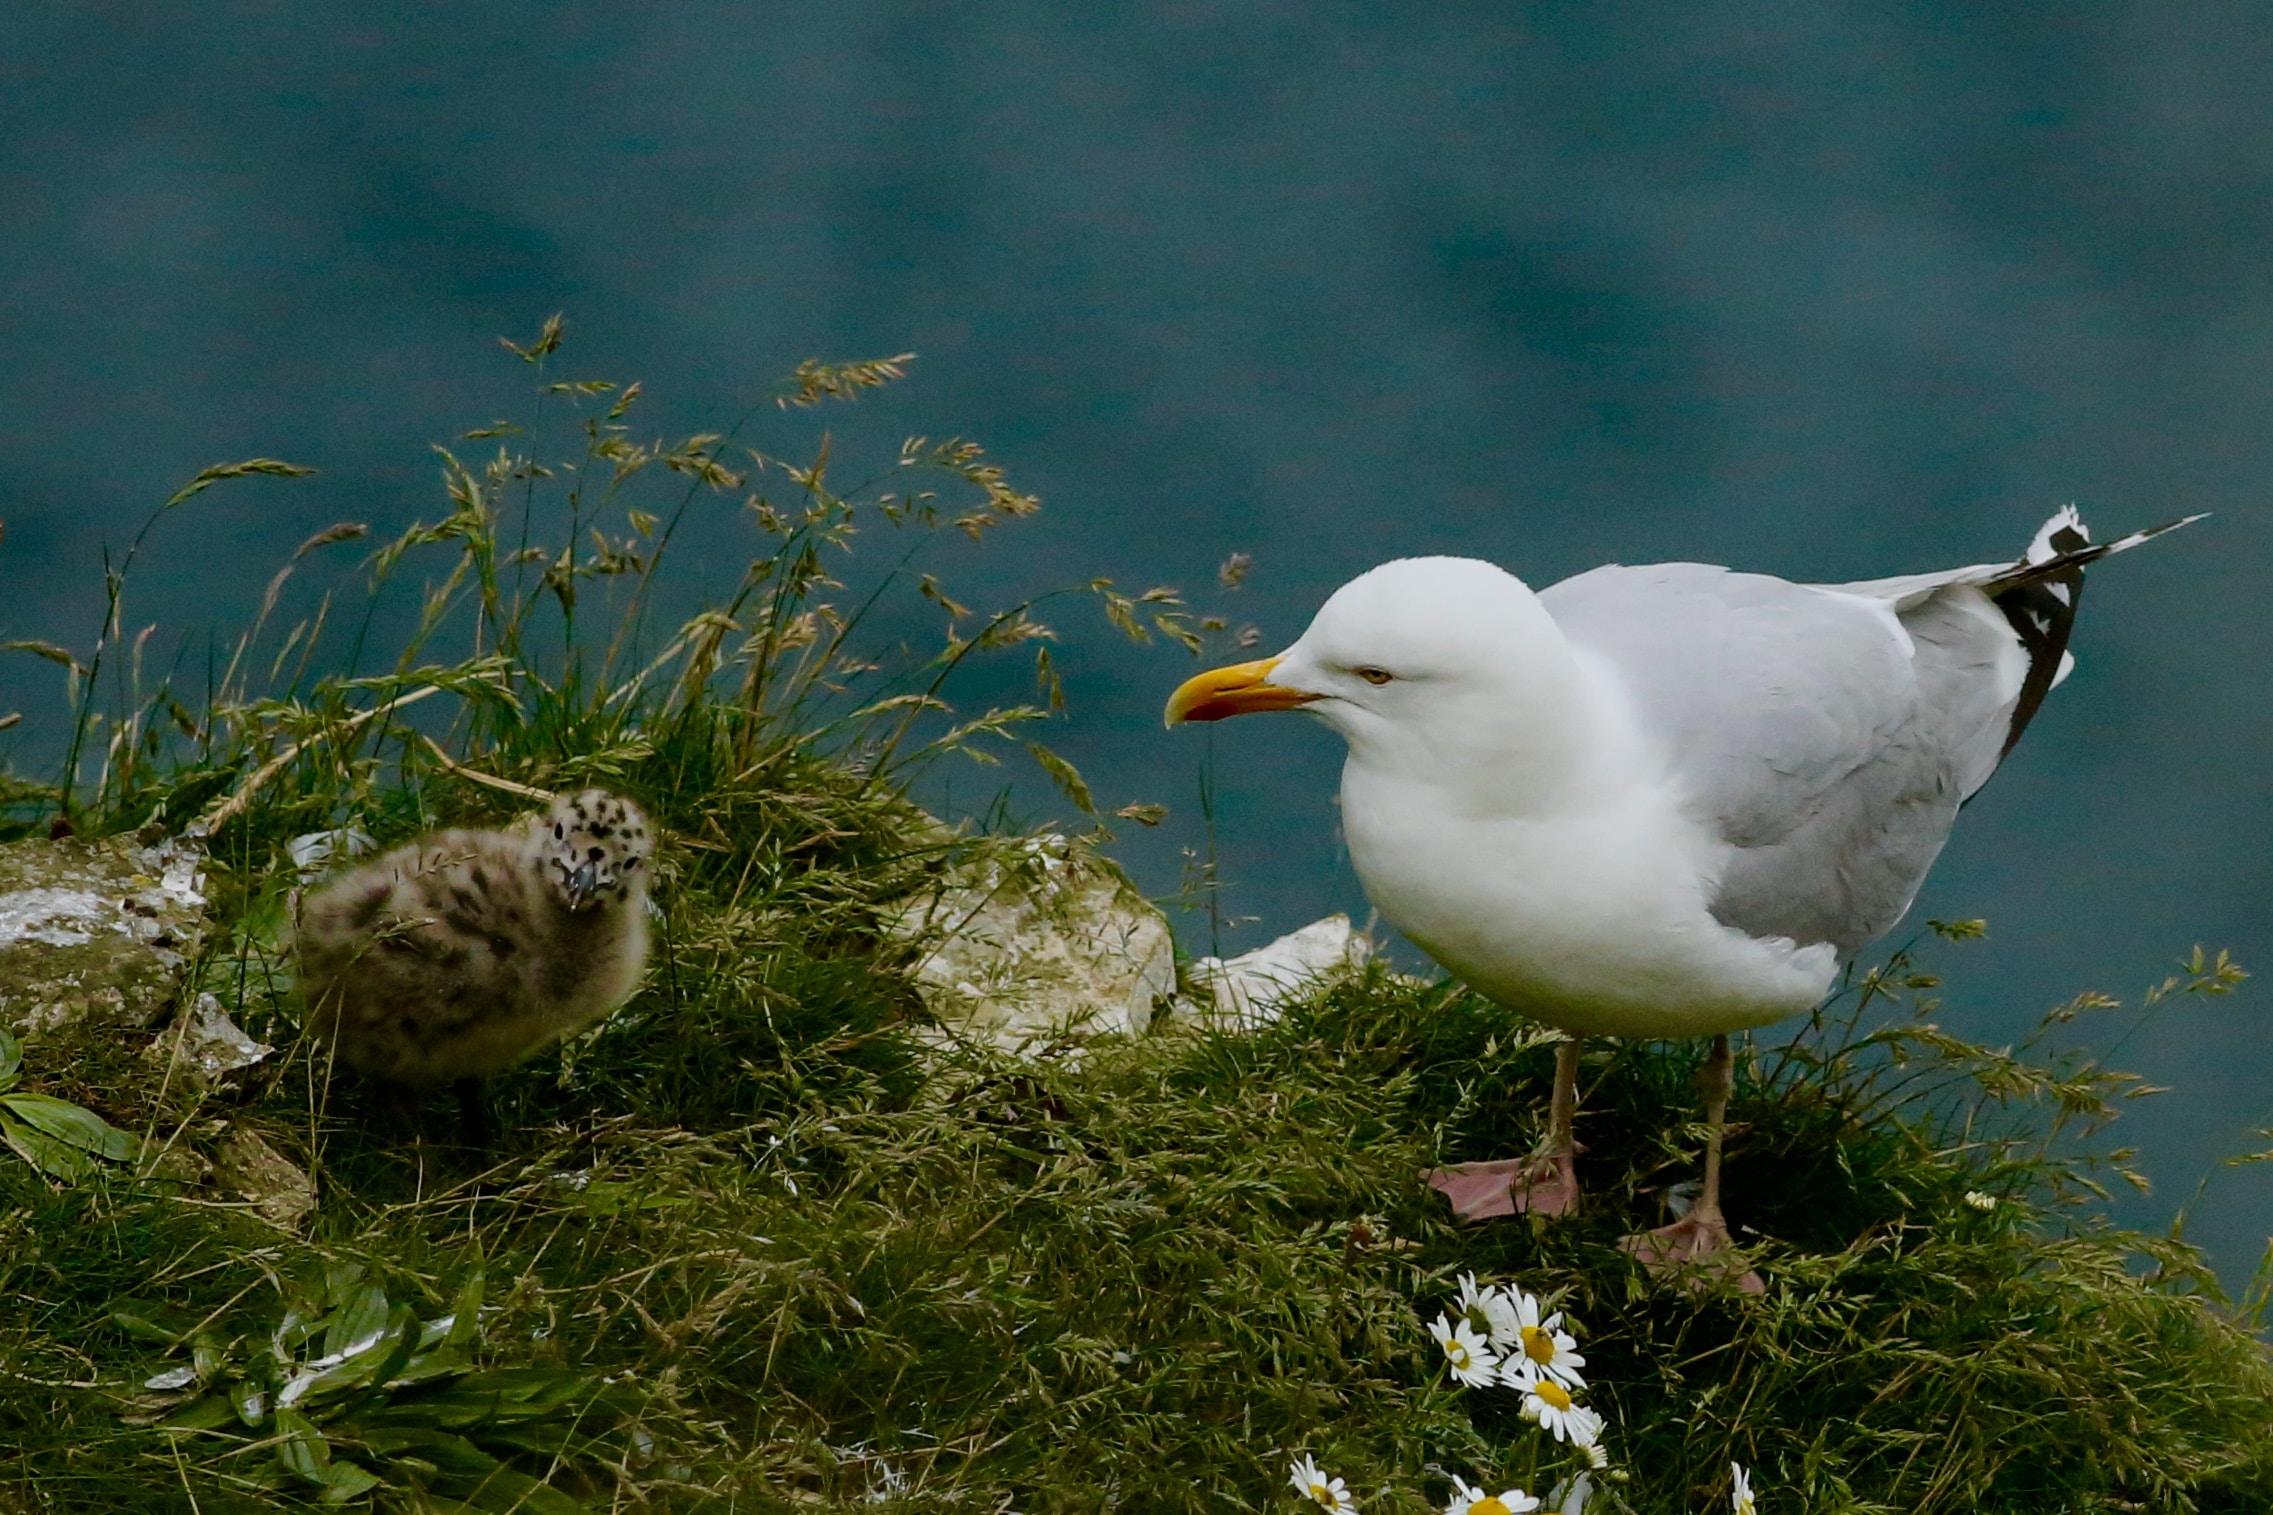 seagull on grass field